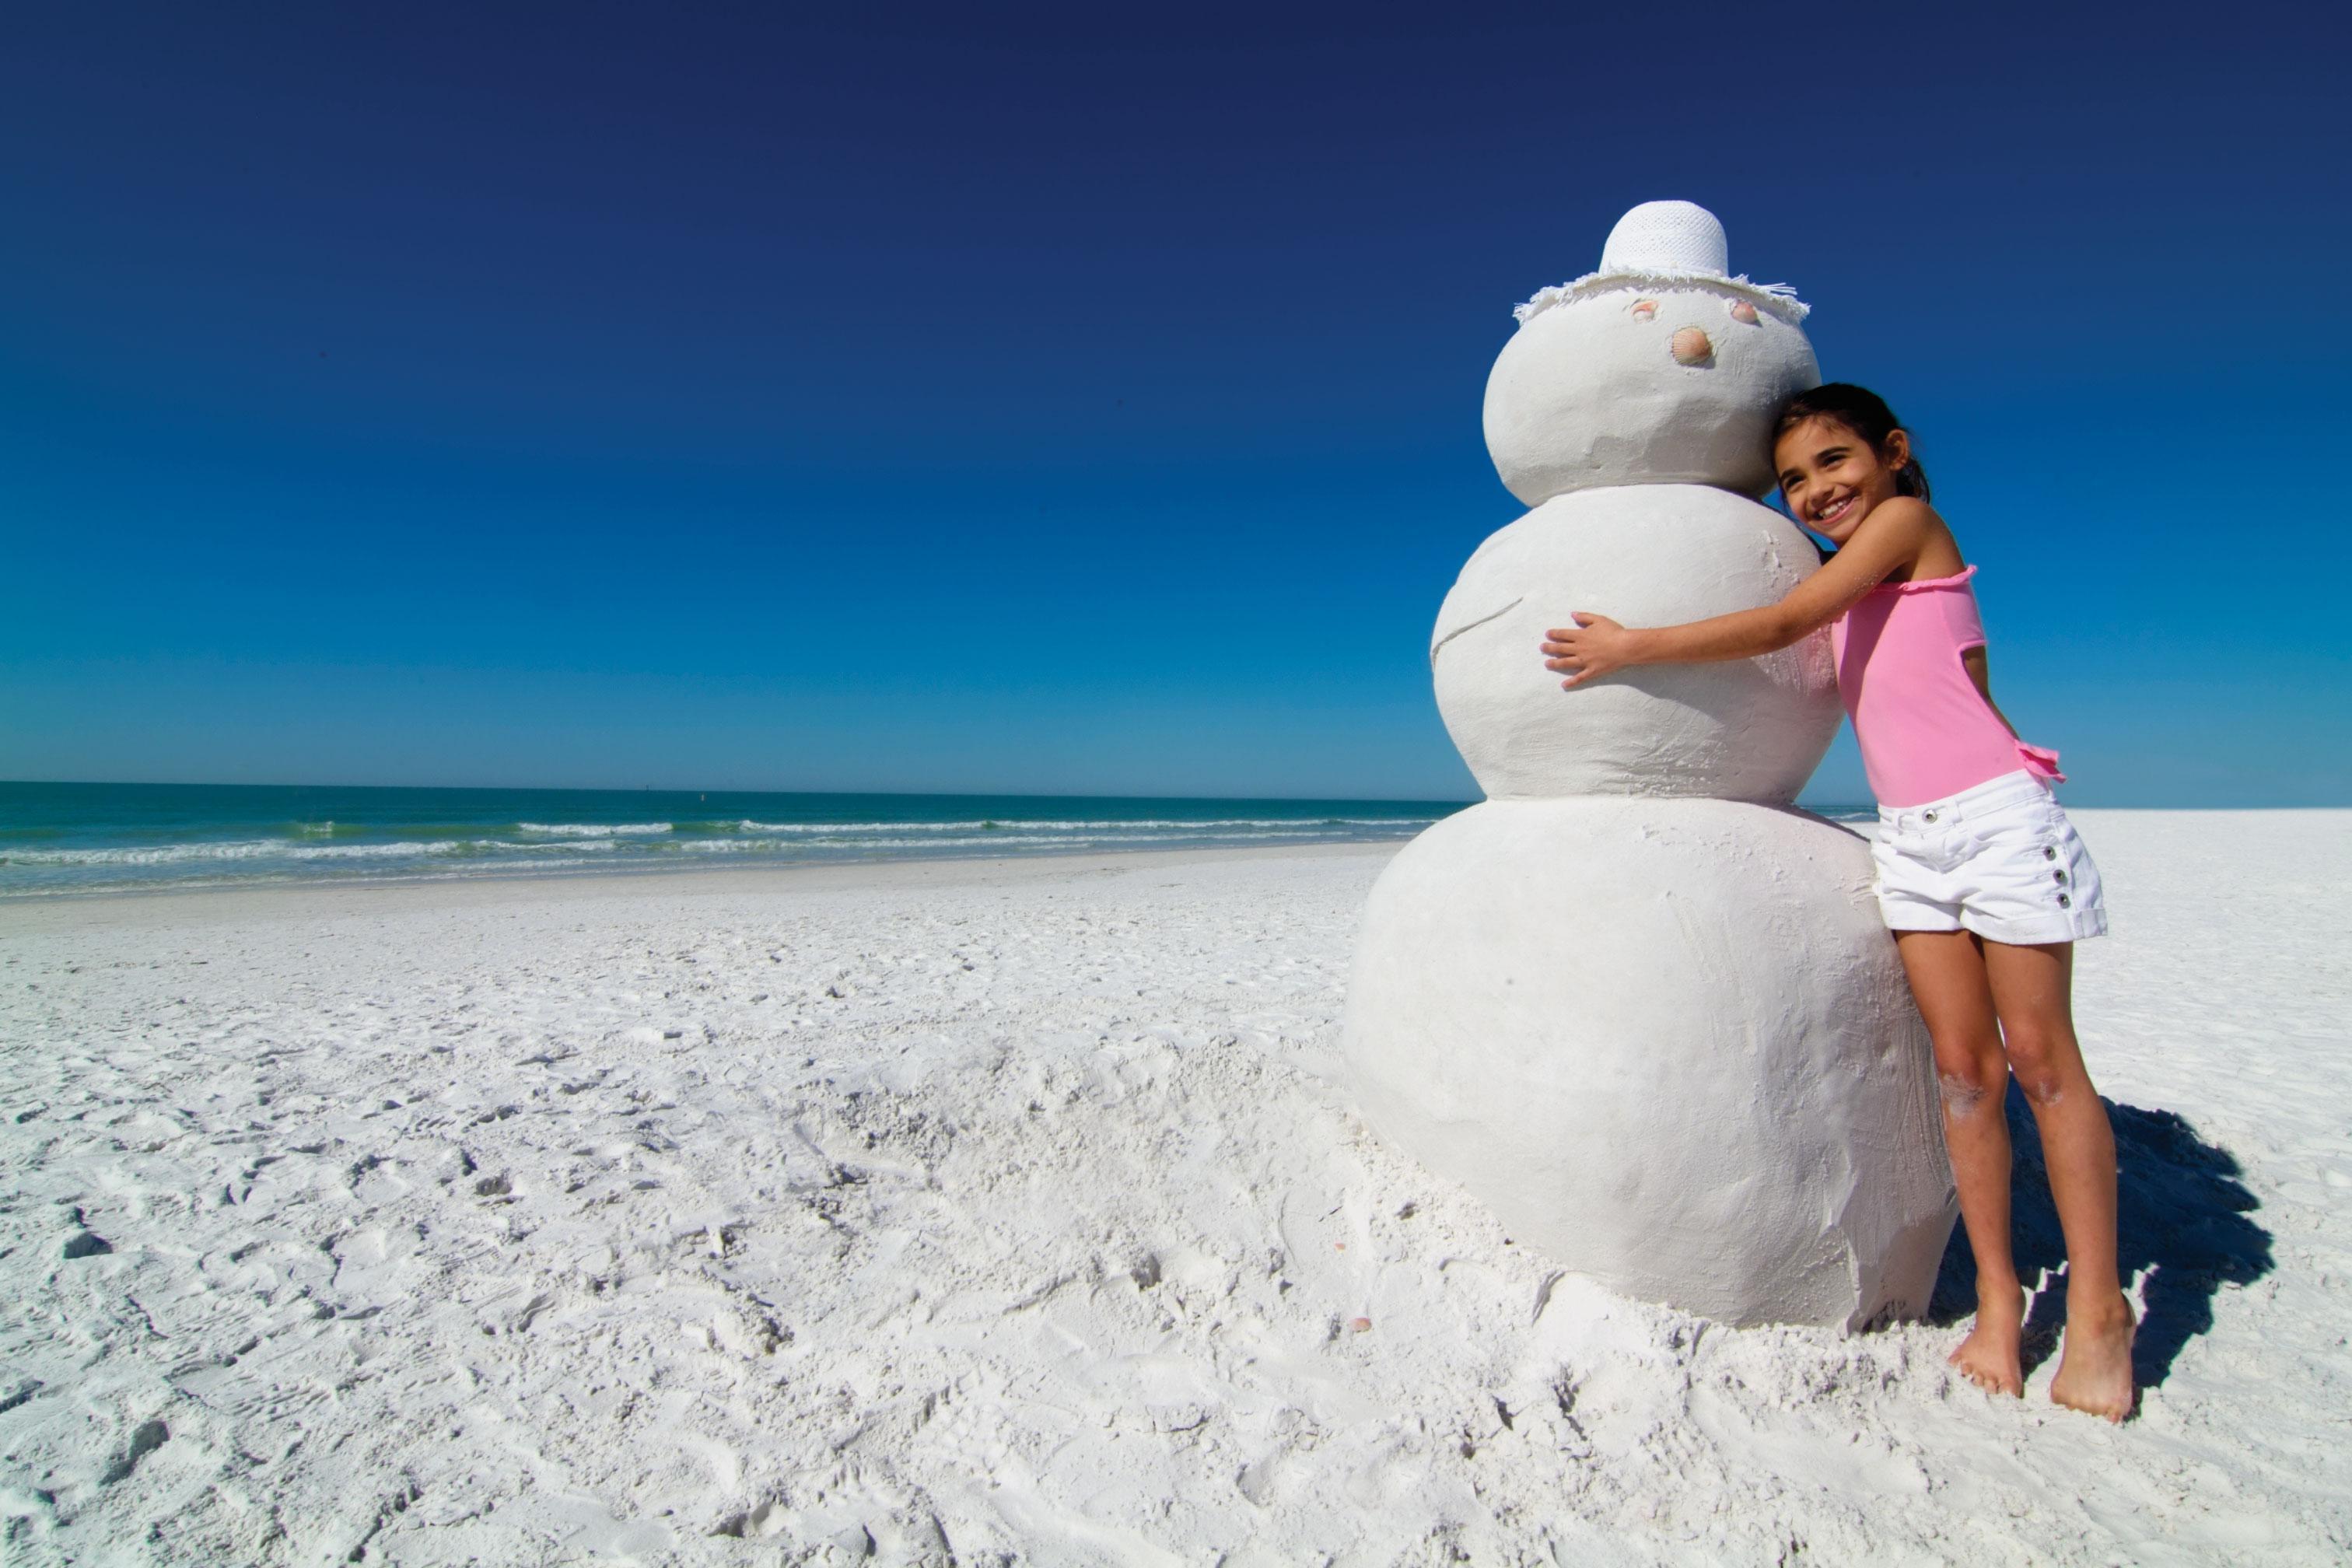 No snow? No problem! Spend the holidays on Siesta Key.